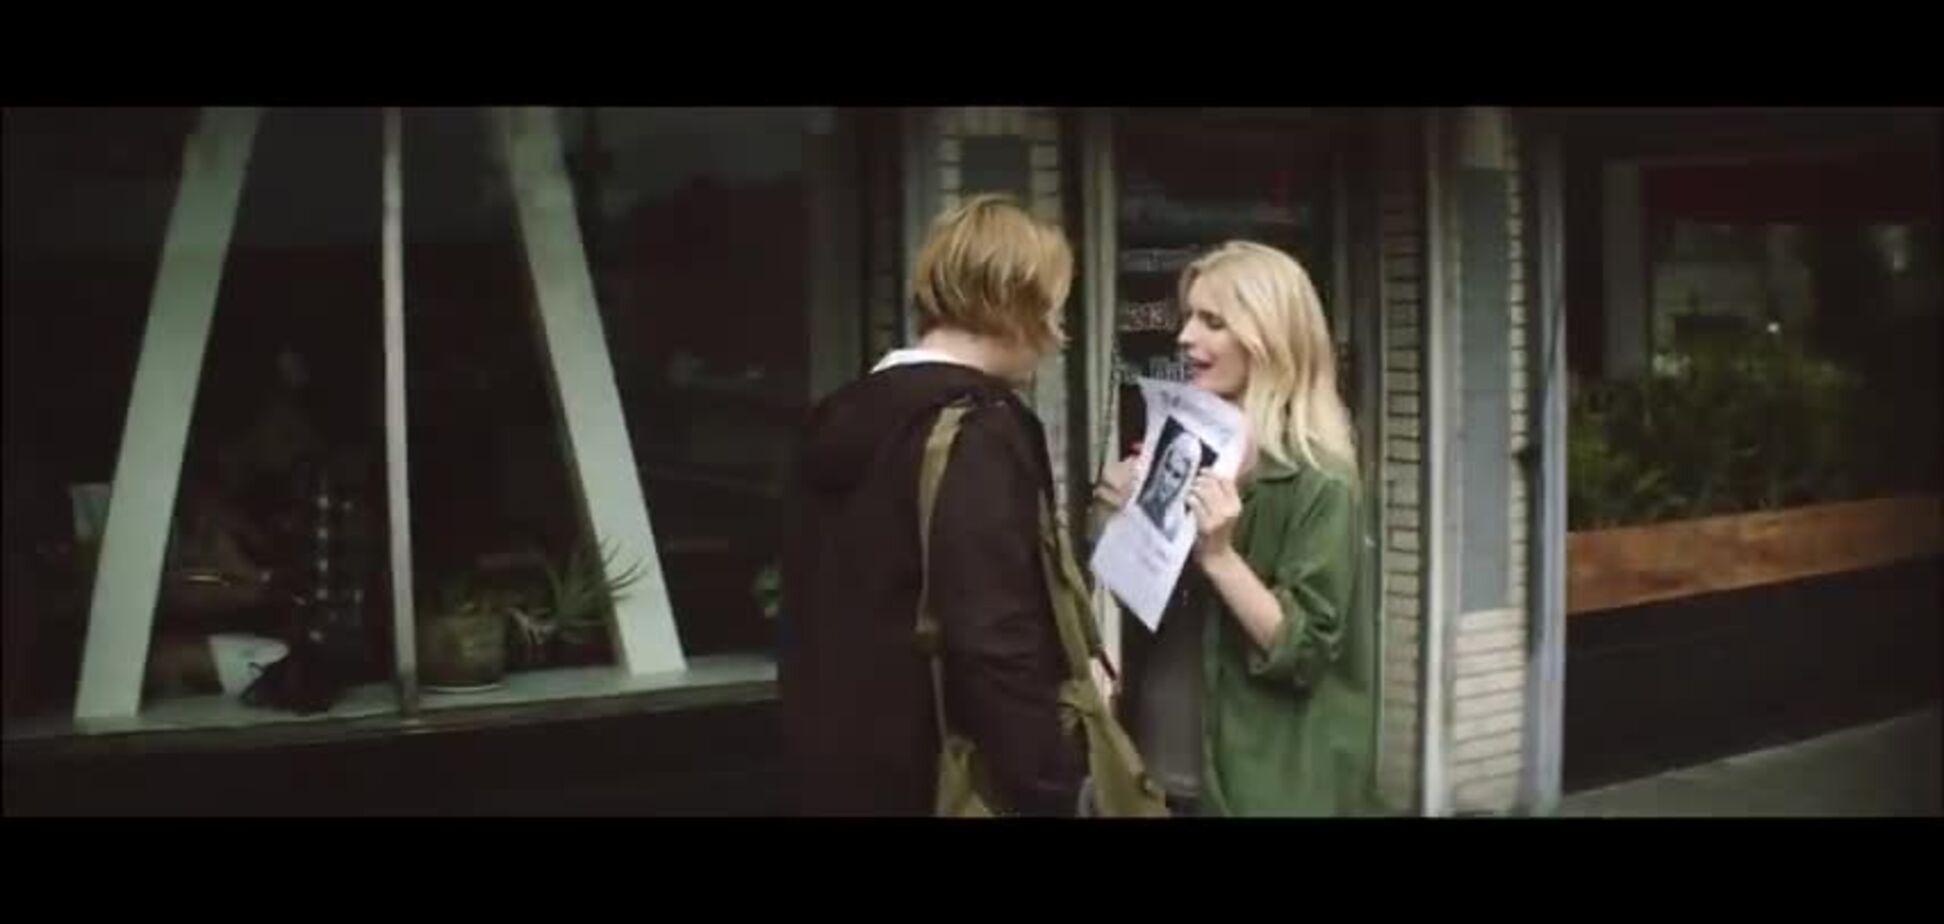 Tom Odell - Another Love (Short Film)